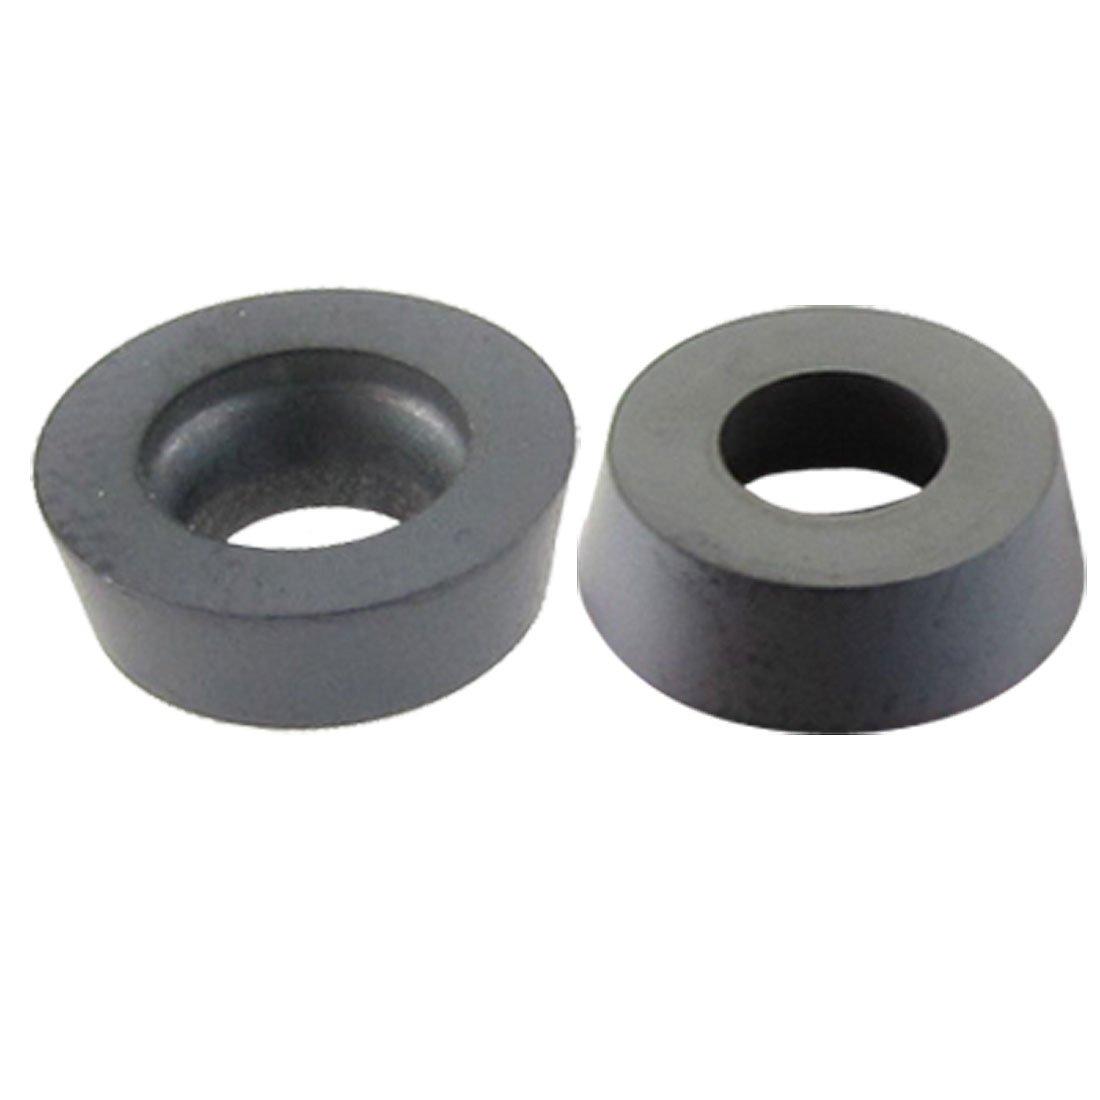 uxcell® Machine Lathe Milling Tool 10mm Dia Round Carbide Insert 10 Pcs